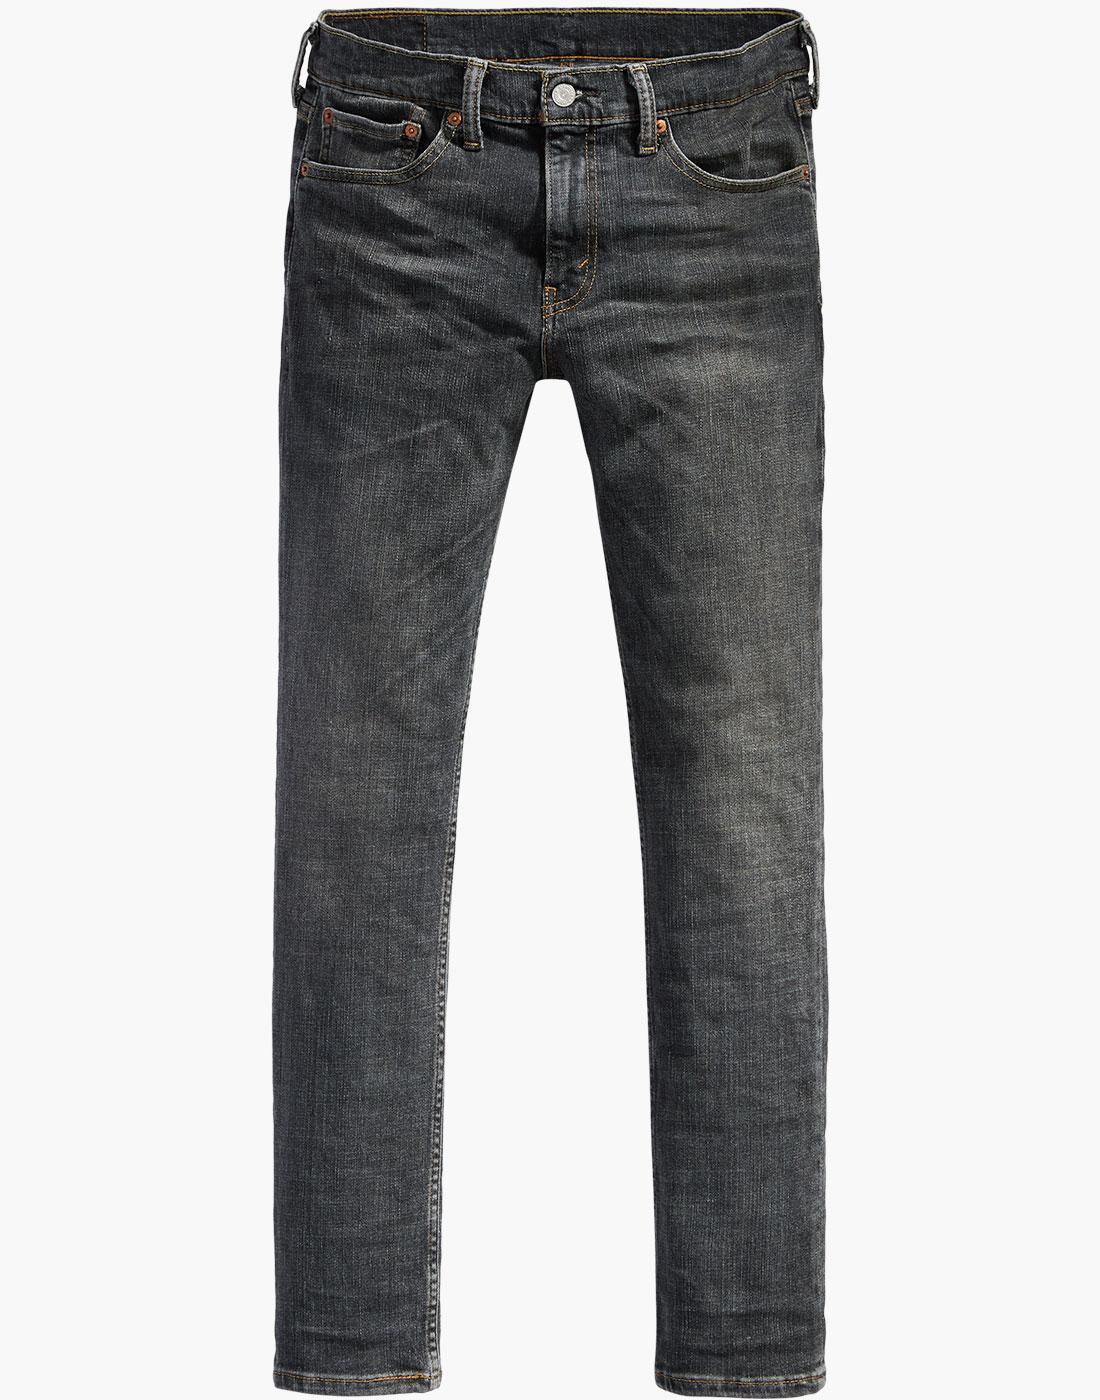 LEVI'S 511 Retro Mod Slim Denim Jeans ARMSTRONG